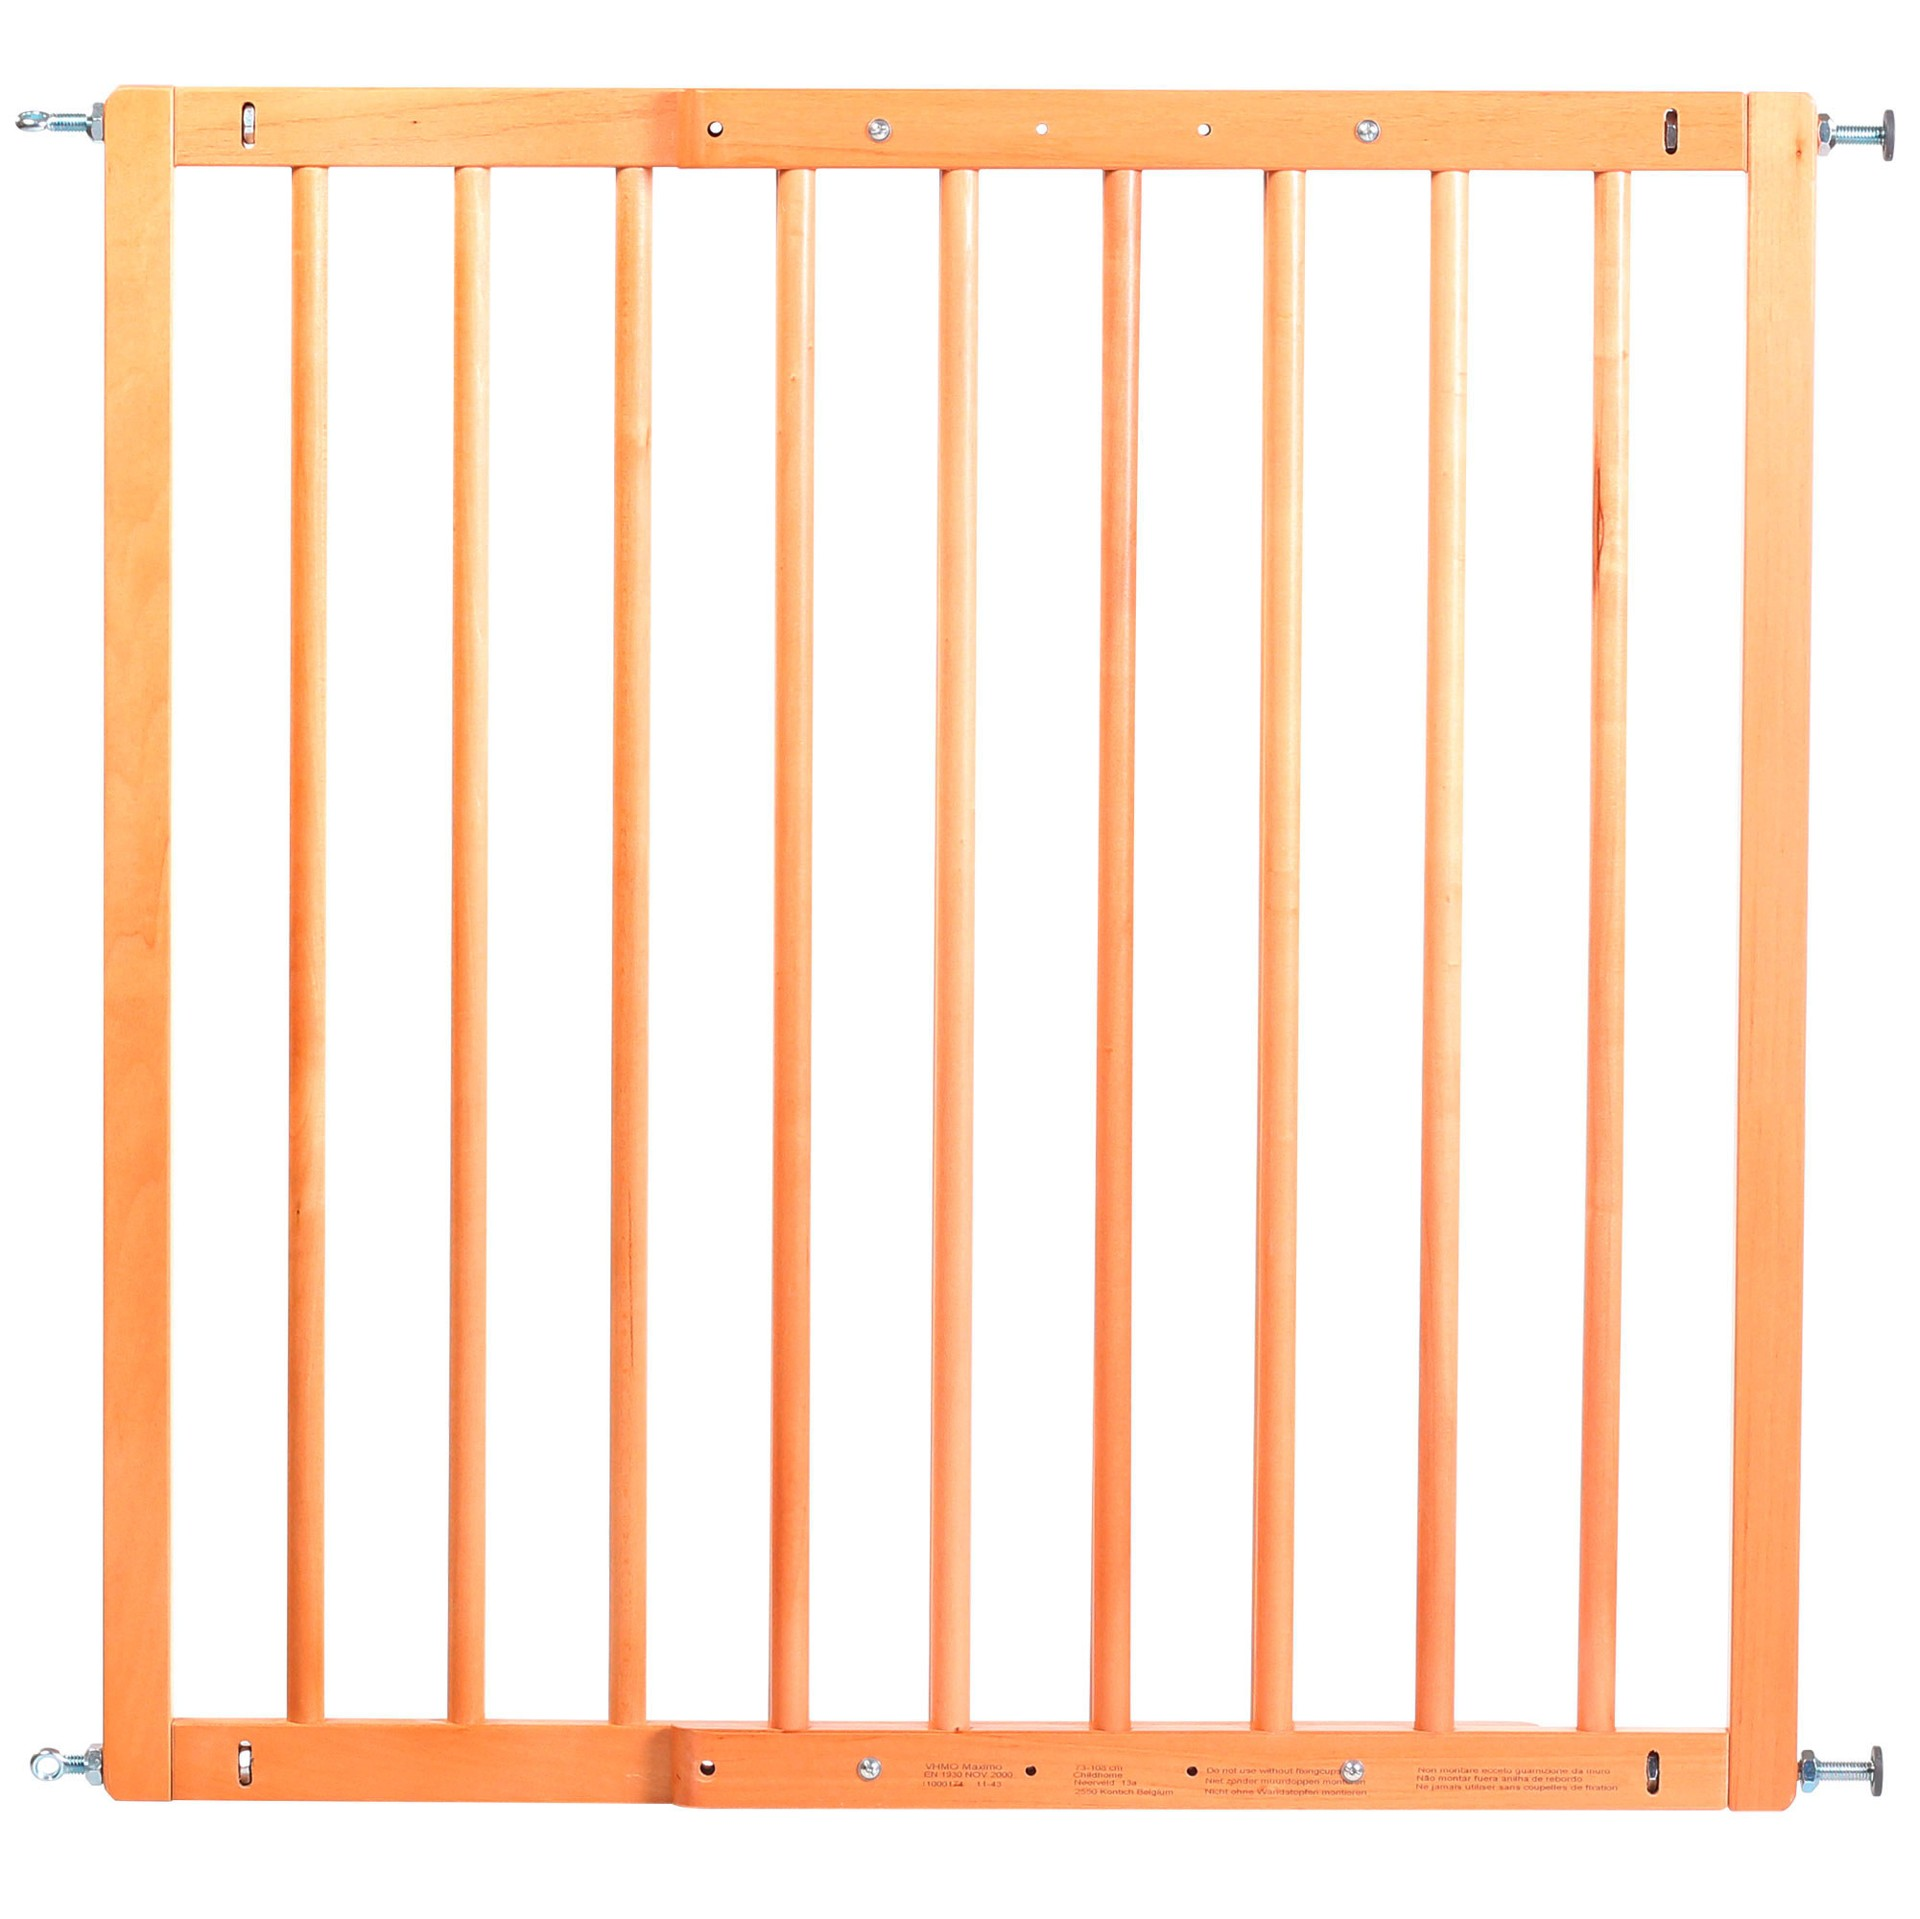 Reer - Twin fix gate basic, Active-Lock, wood (46211)